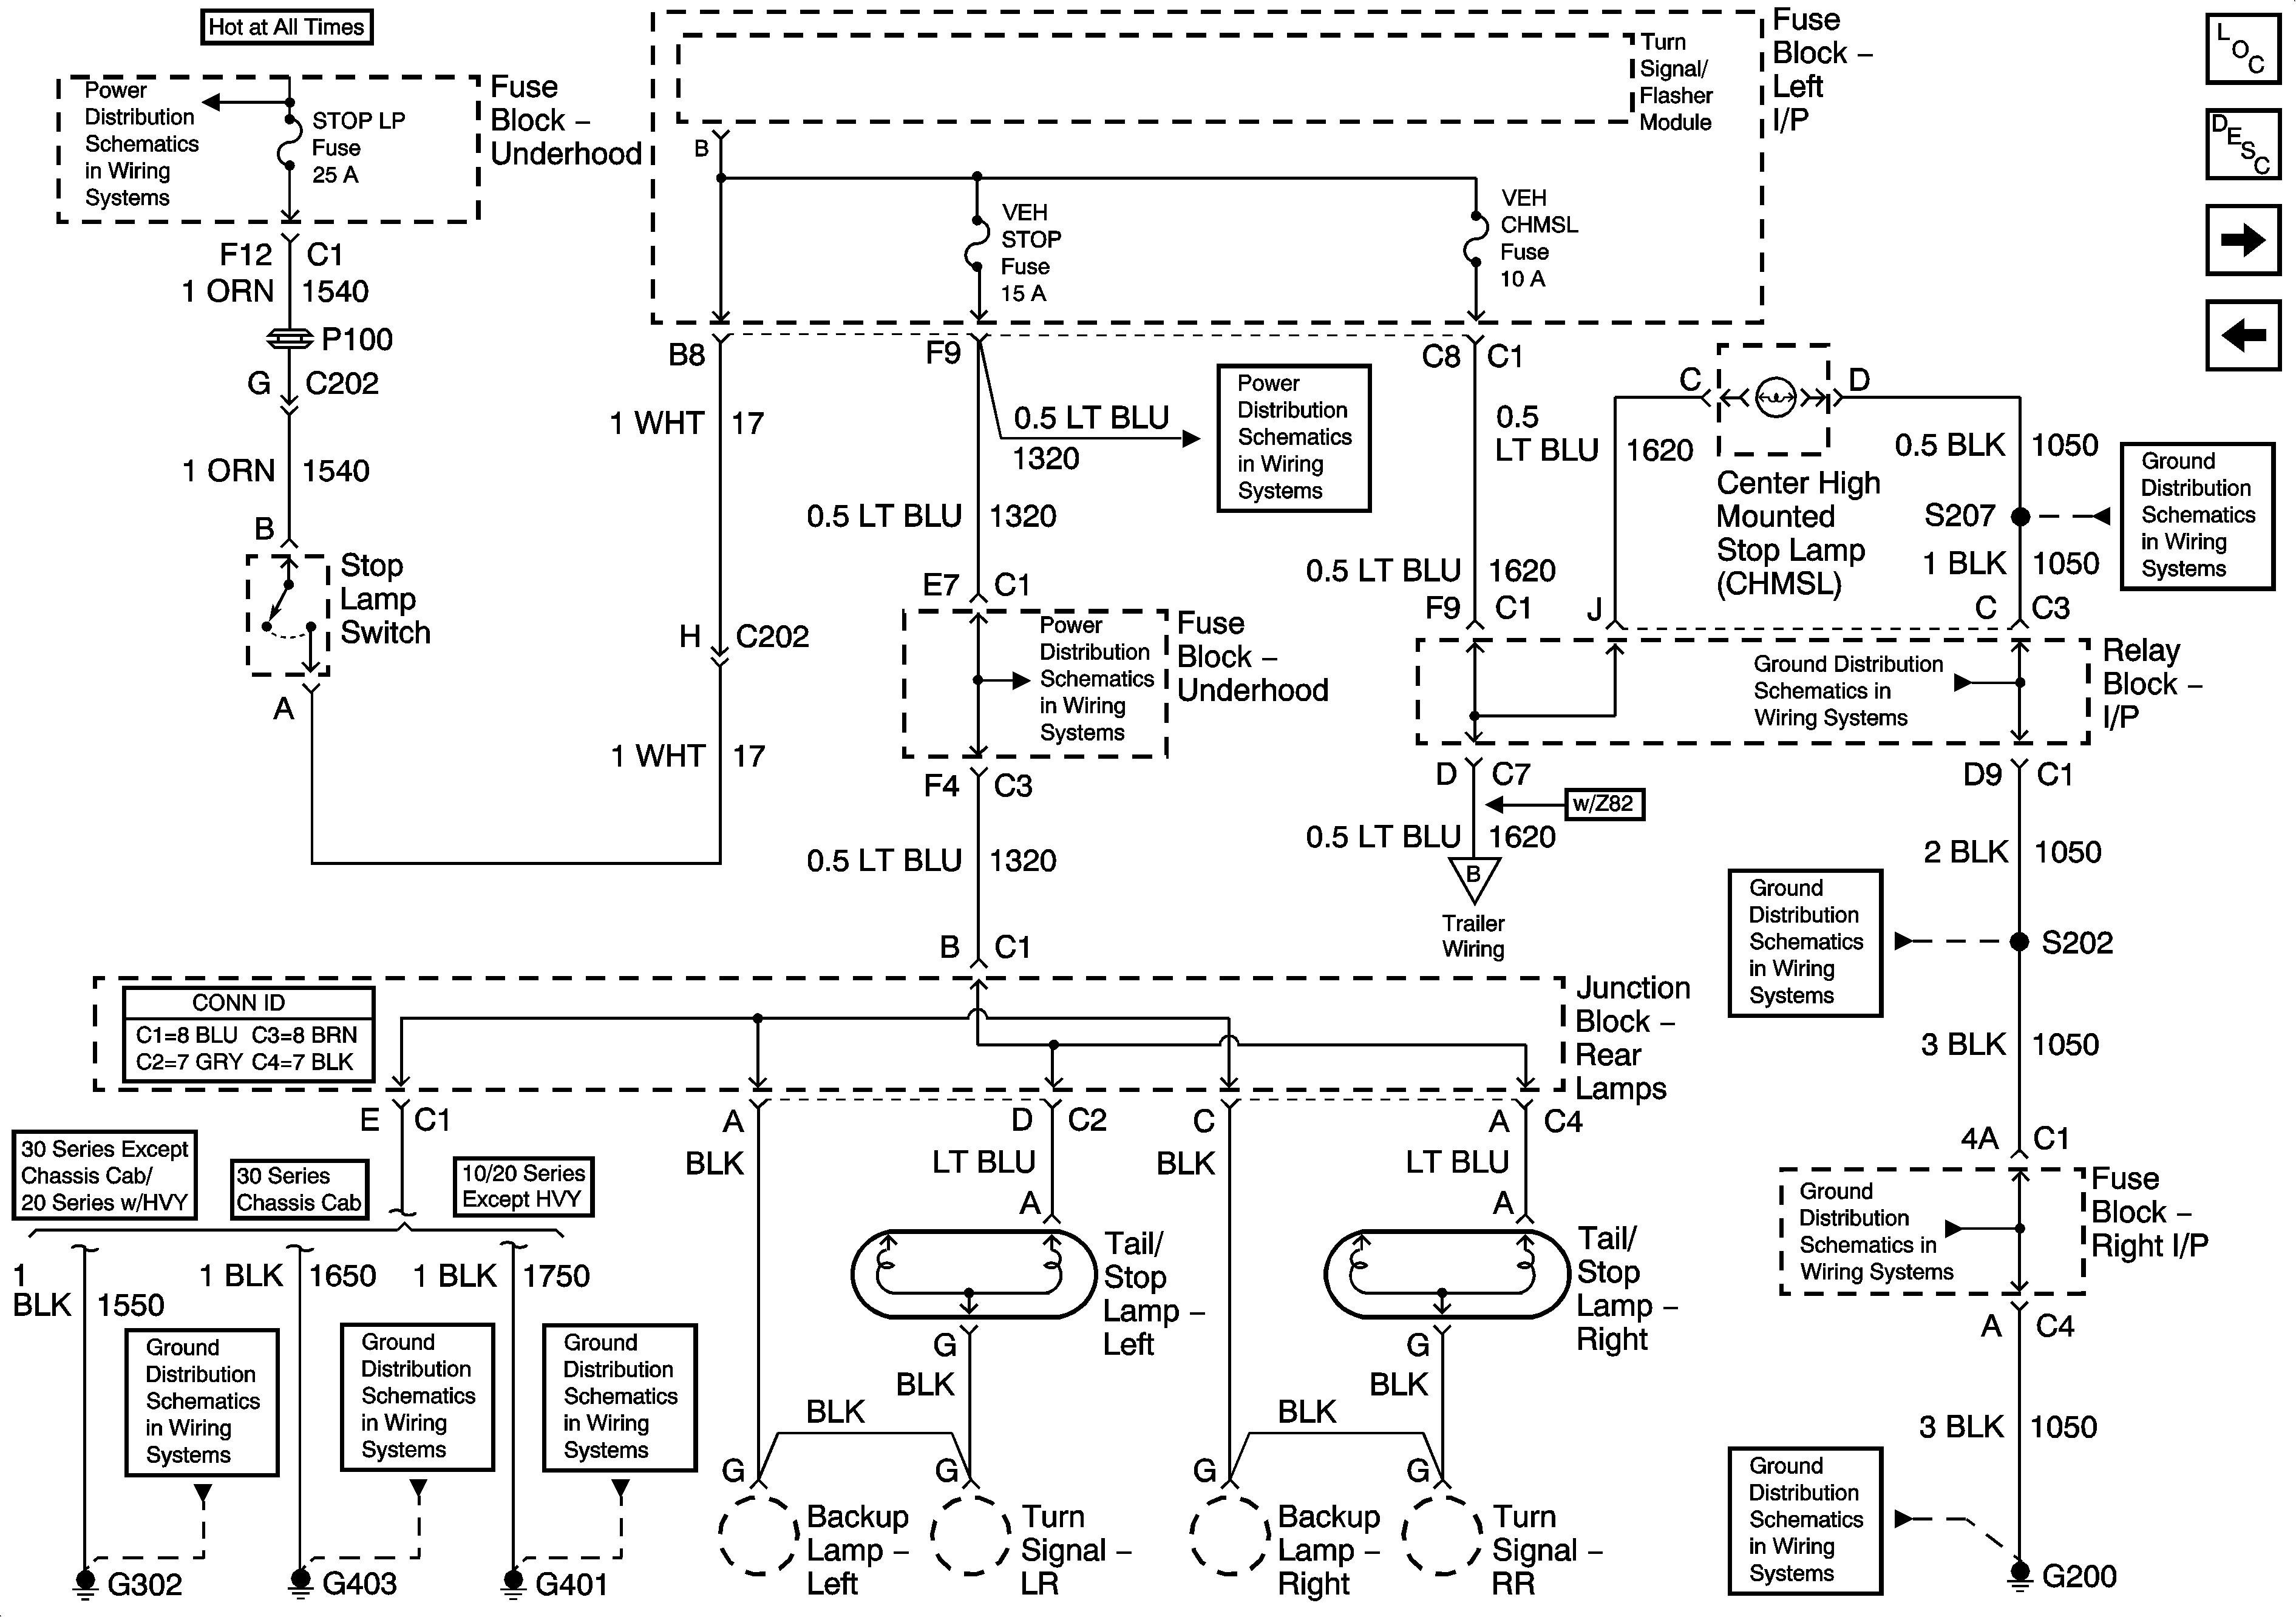 5 3 Wiring Harness Diagram Fresh 2004 Silverado Wiring Diagram & 2001 Jeep Grand Cherokee Tail